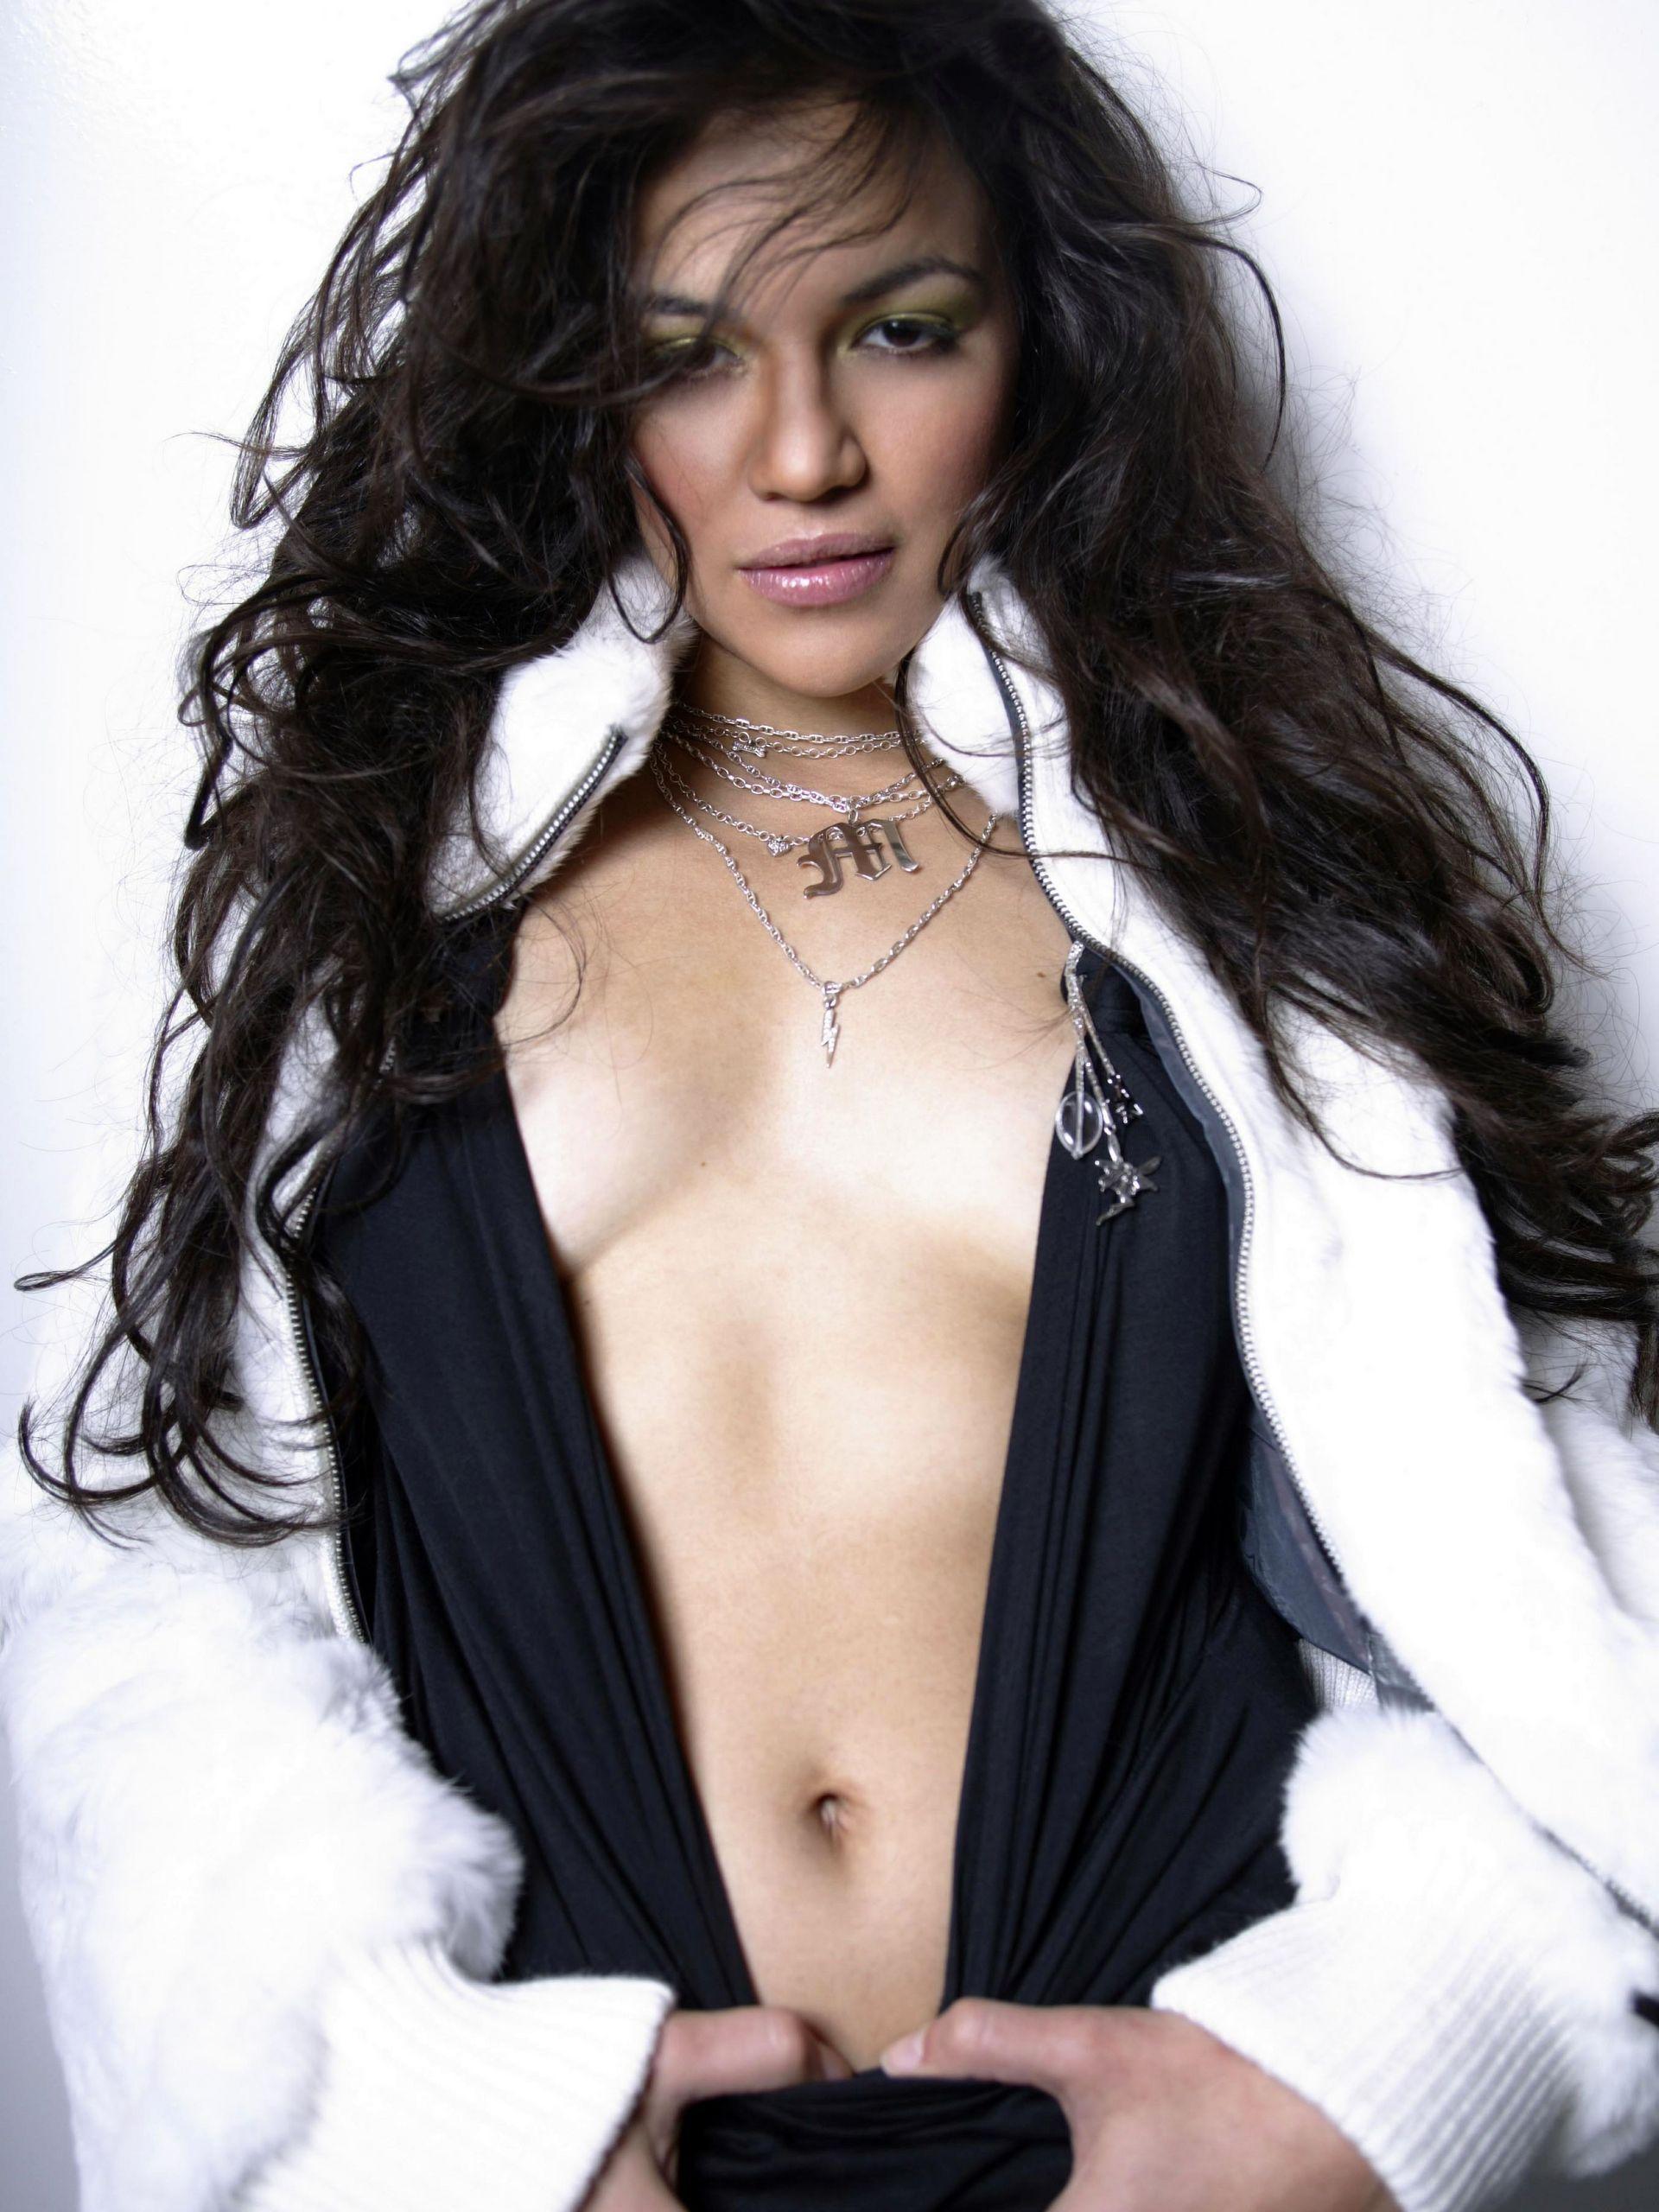 Michelle rodriguez sexy new foto